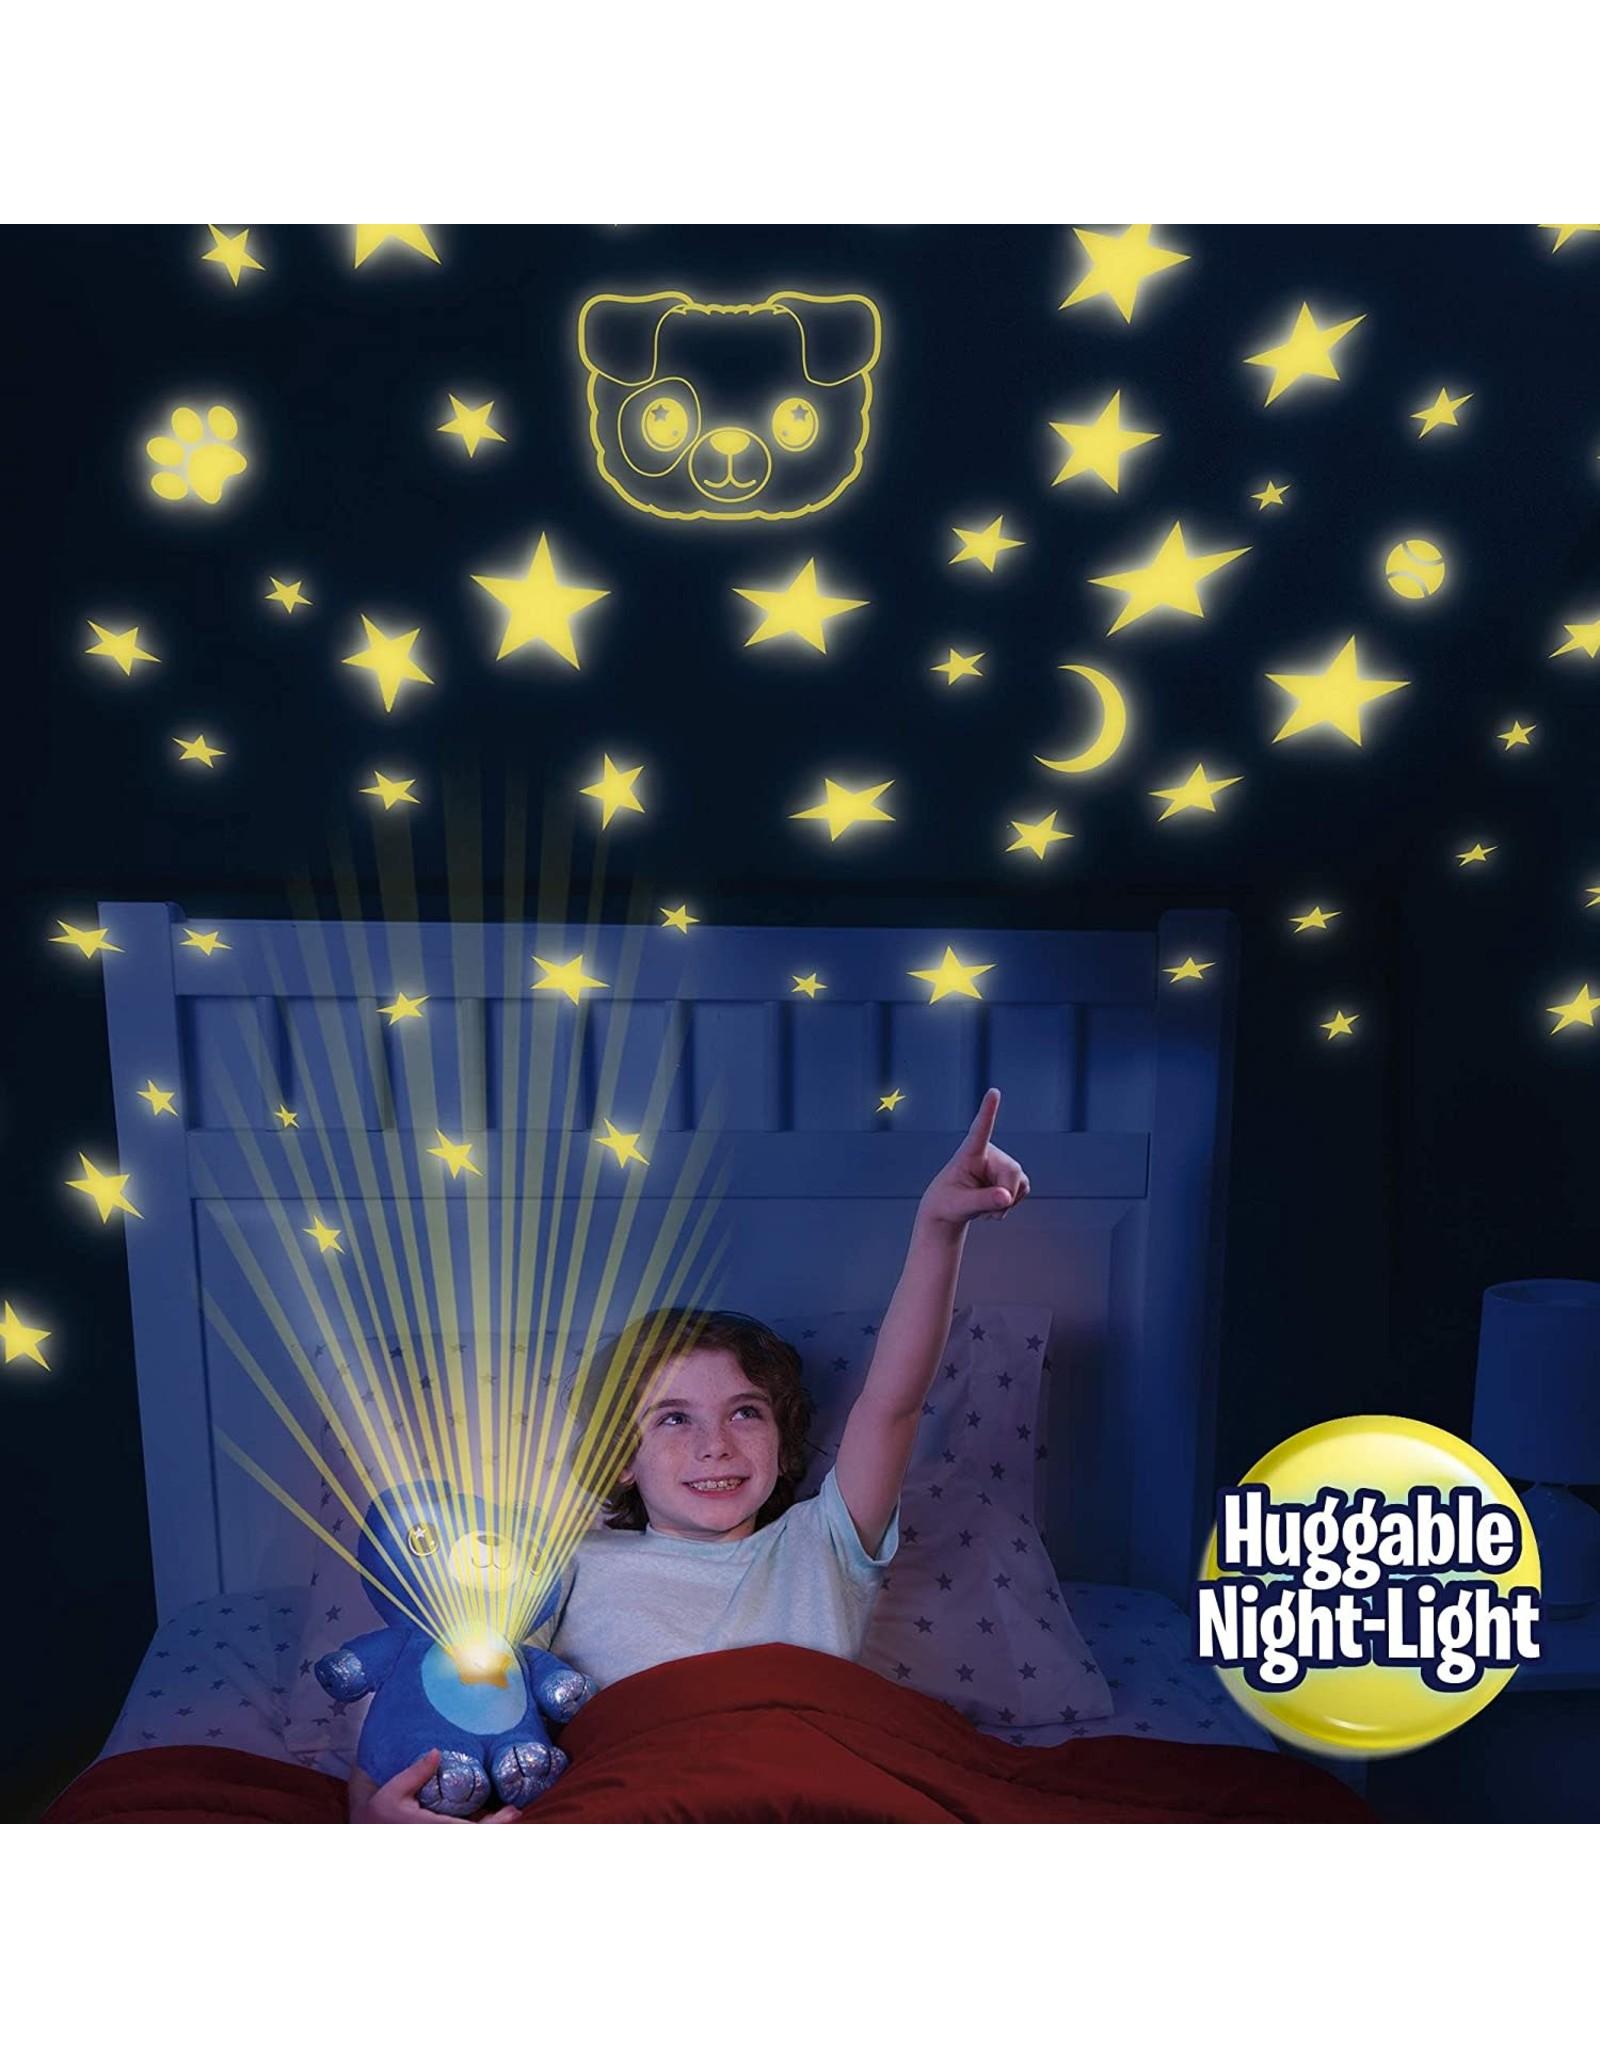 Ontel Ontel Star Belly Dream Lites, Stuffed Animal Night Light, Cuddly Blue Puppy